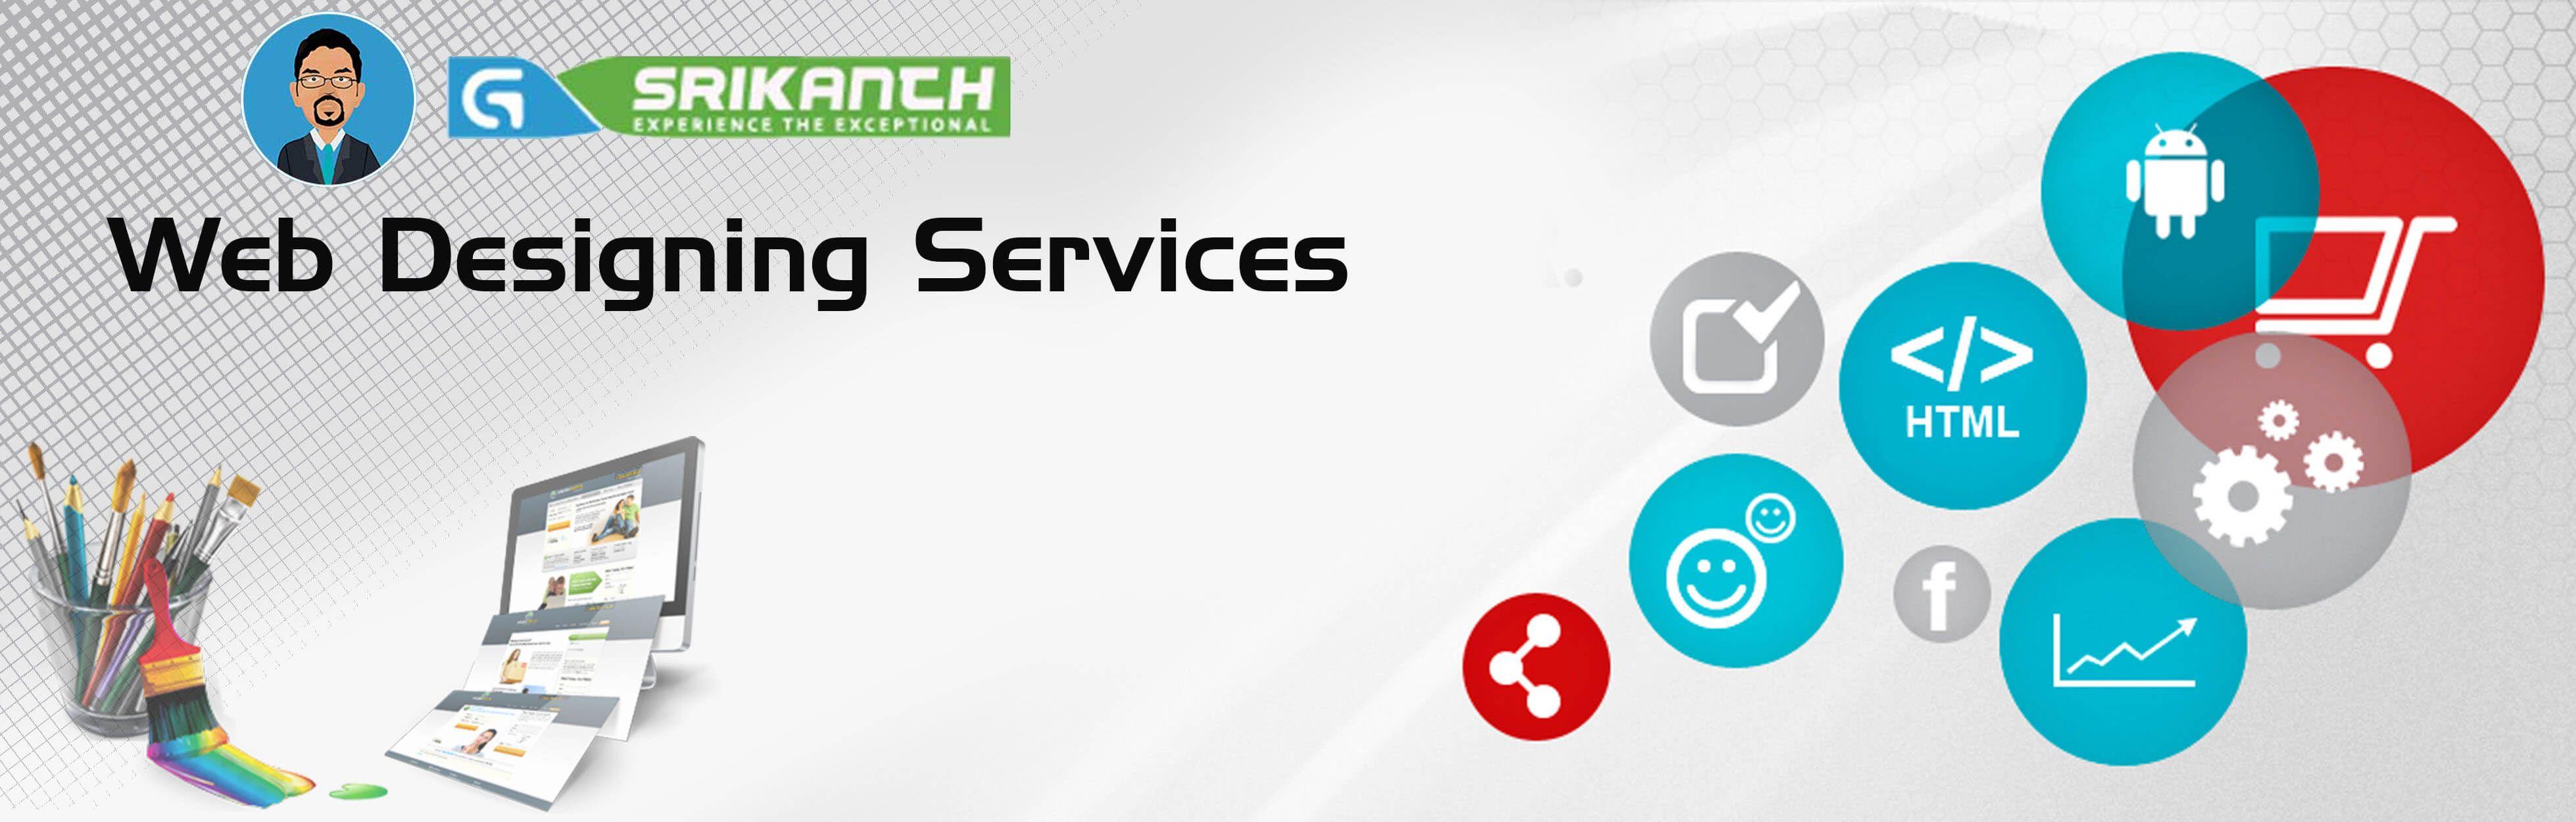 Freelance Web Designer In Hyderabad Website Designing Services Web Design Freelance Web Design Website Design